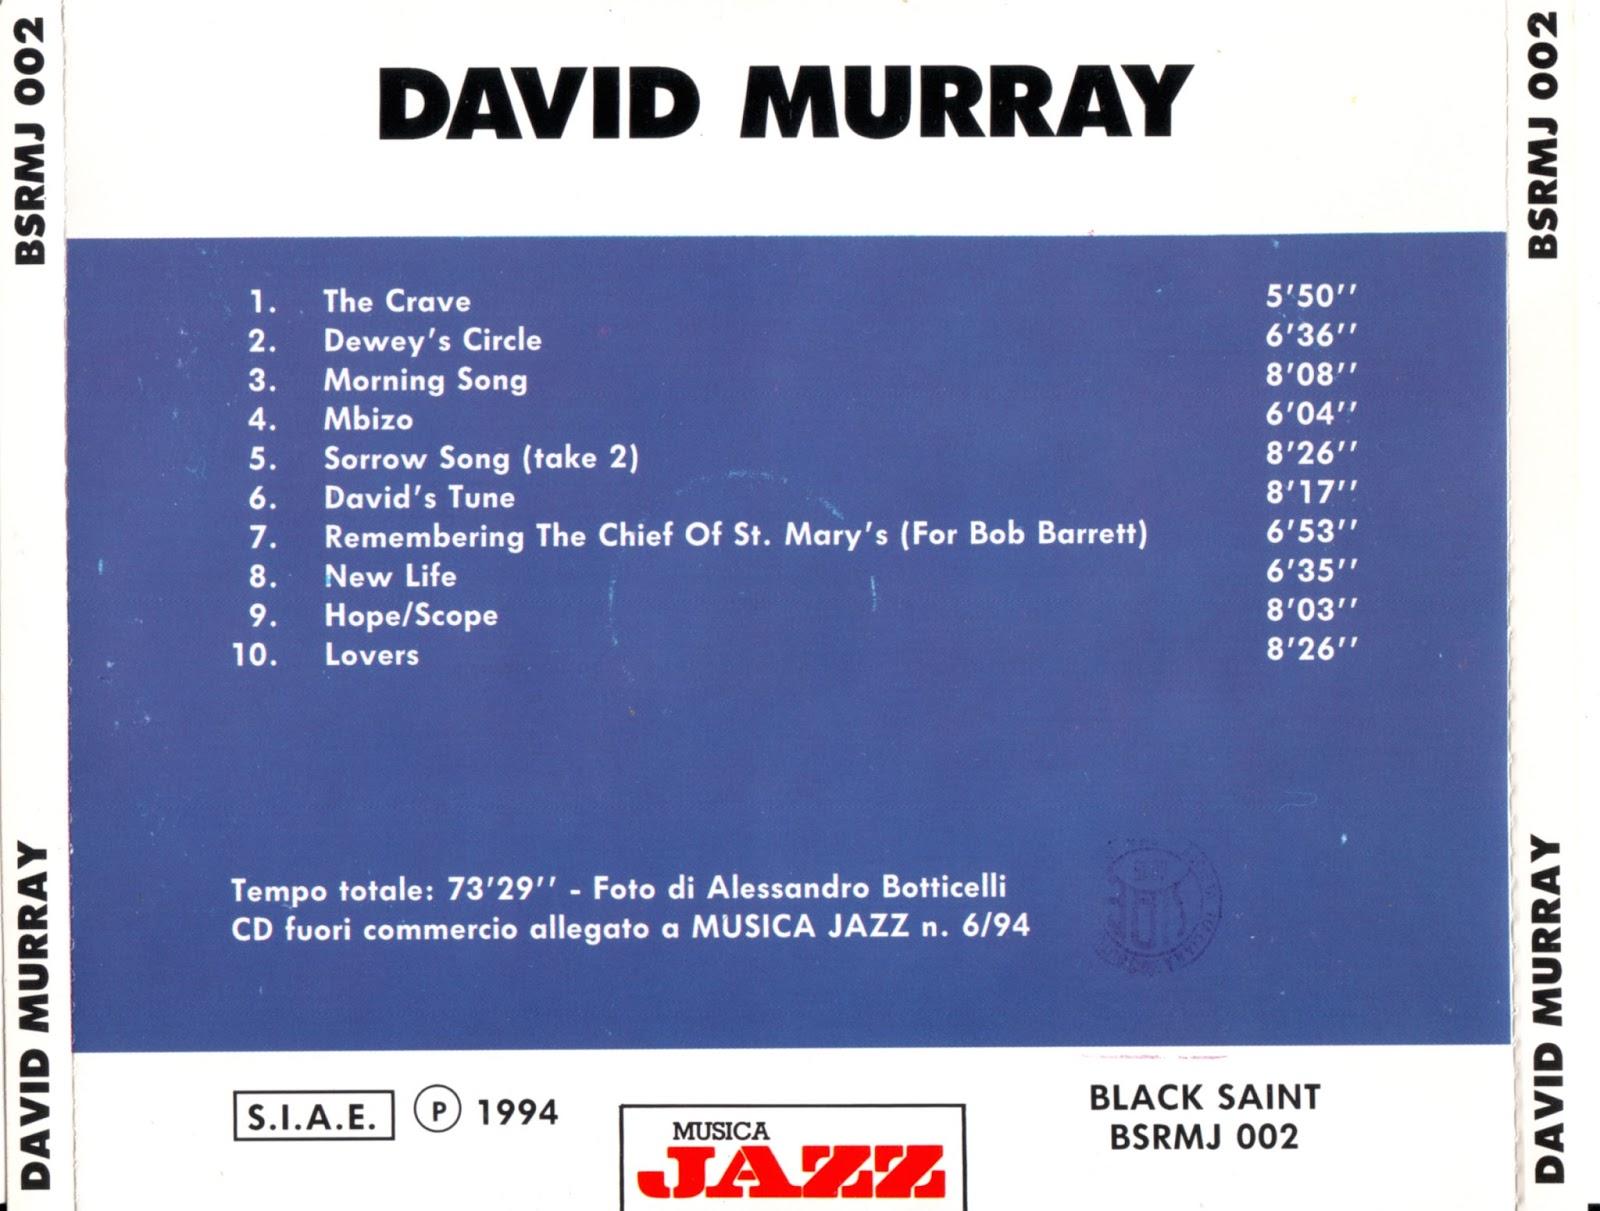 Clarinet Summit Alvin Batiste Jimmy Hamilton John Carter 3 David Murray In Concert At The Public The